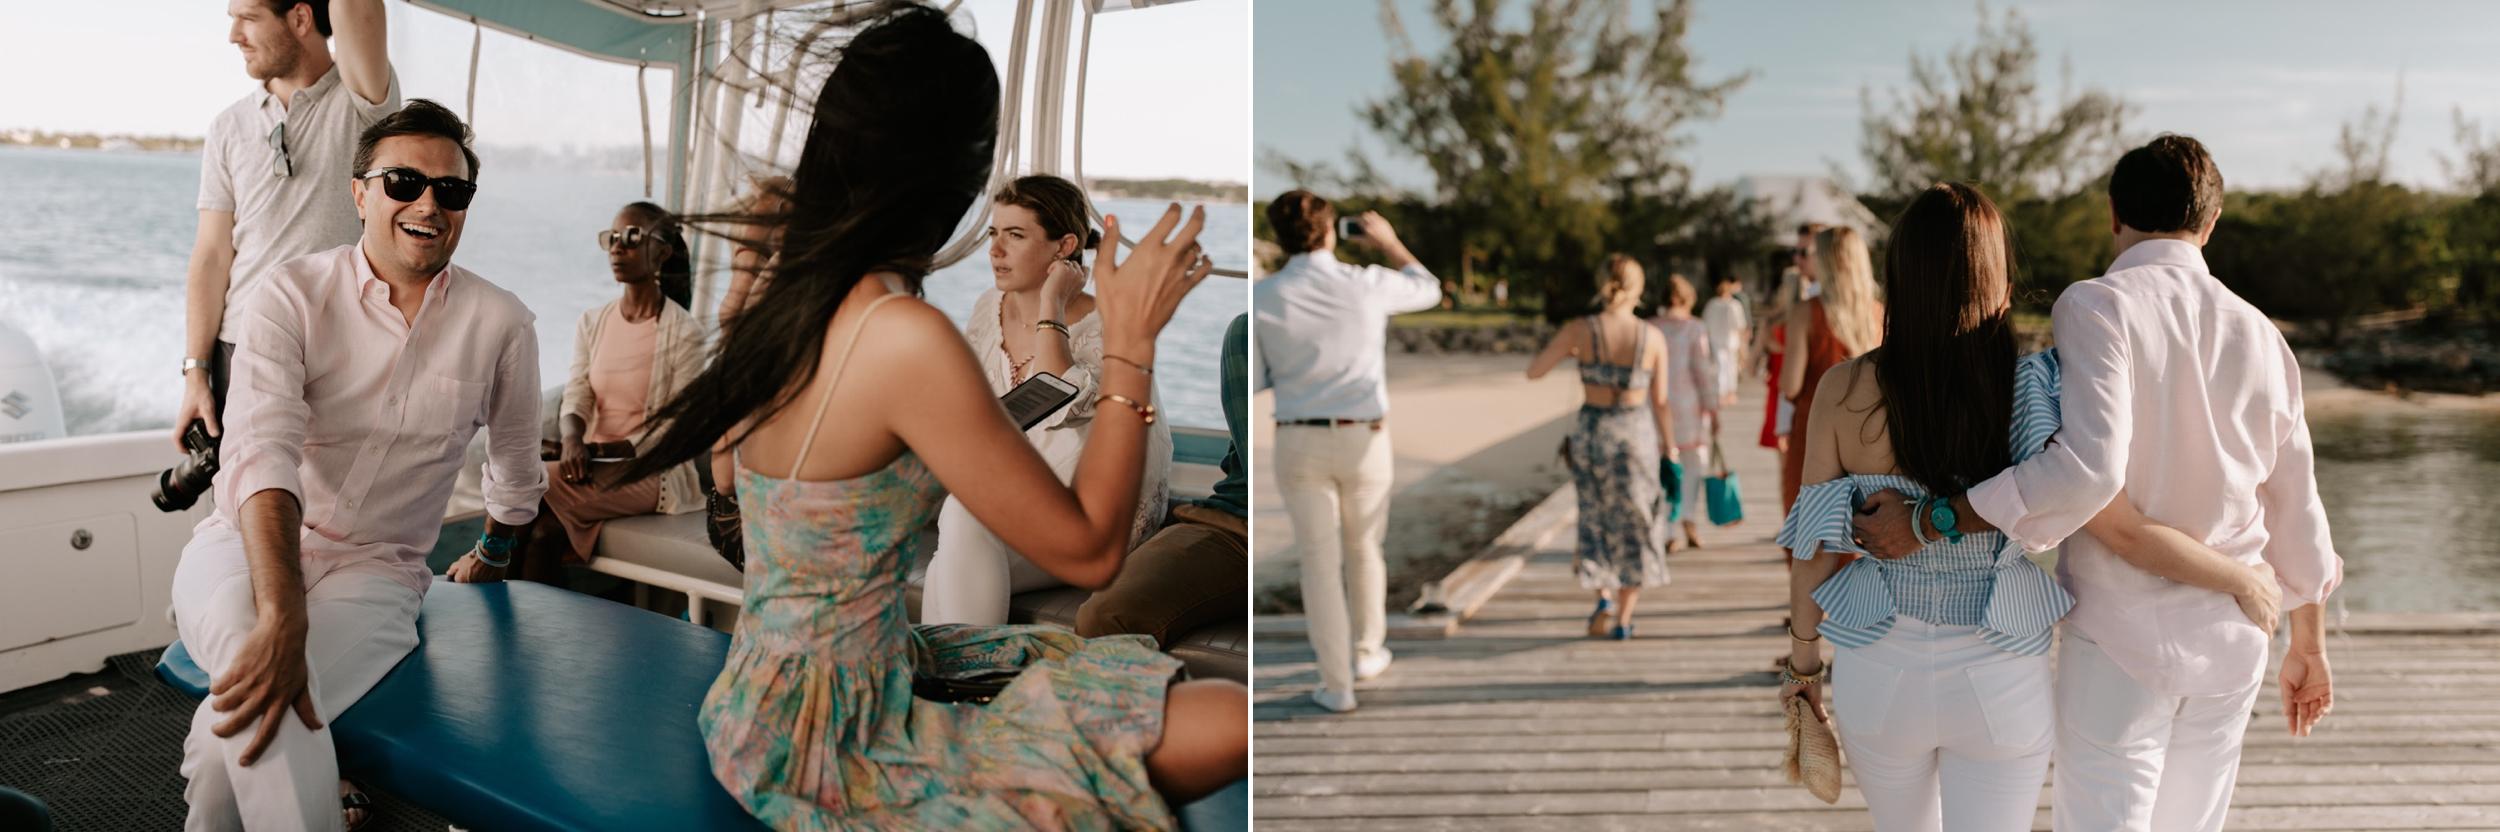 Harbour-Island-Ocean-View-Club-Wedding-Photographer_5.jpg